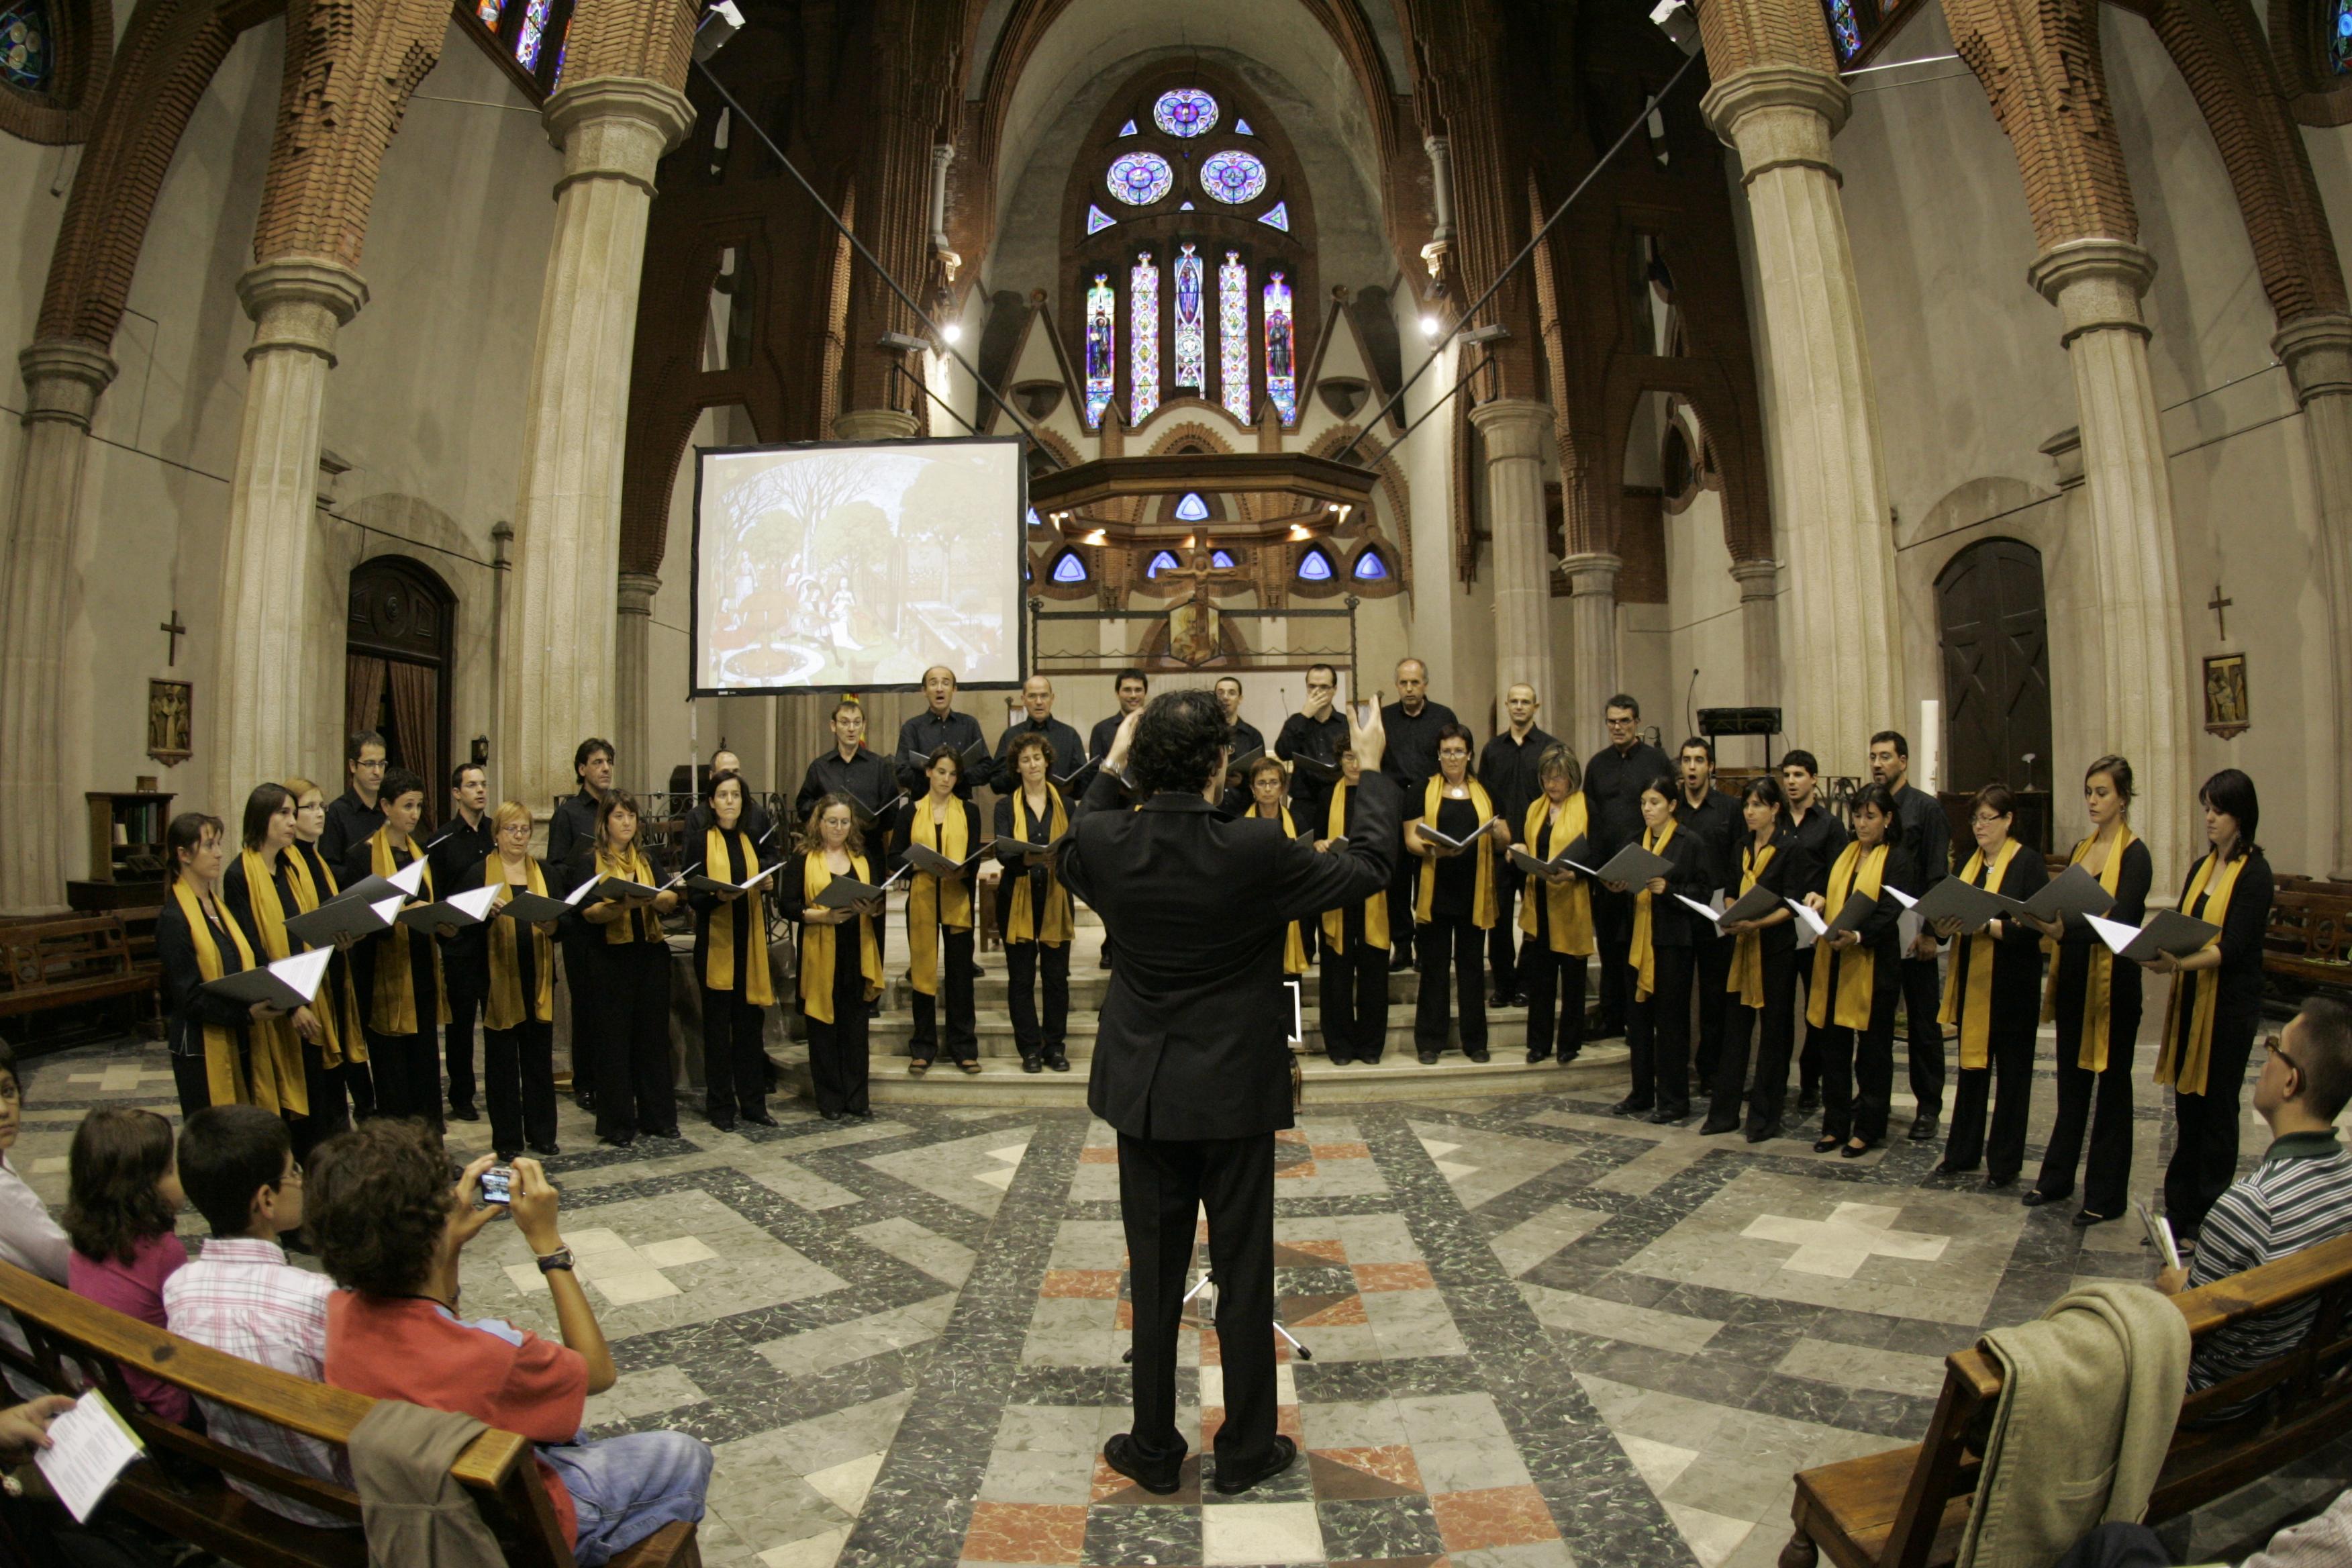 Concert a l'església de Sant Agustí, 28.9.08